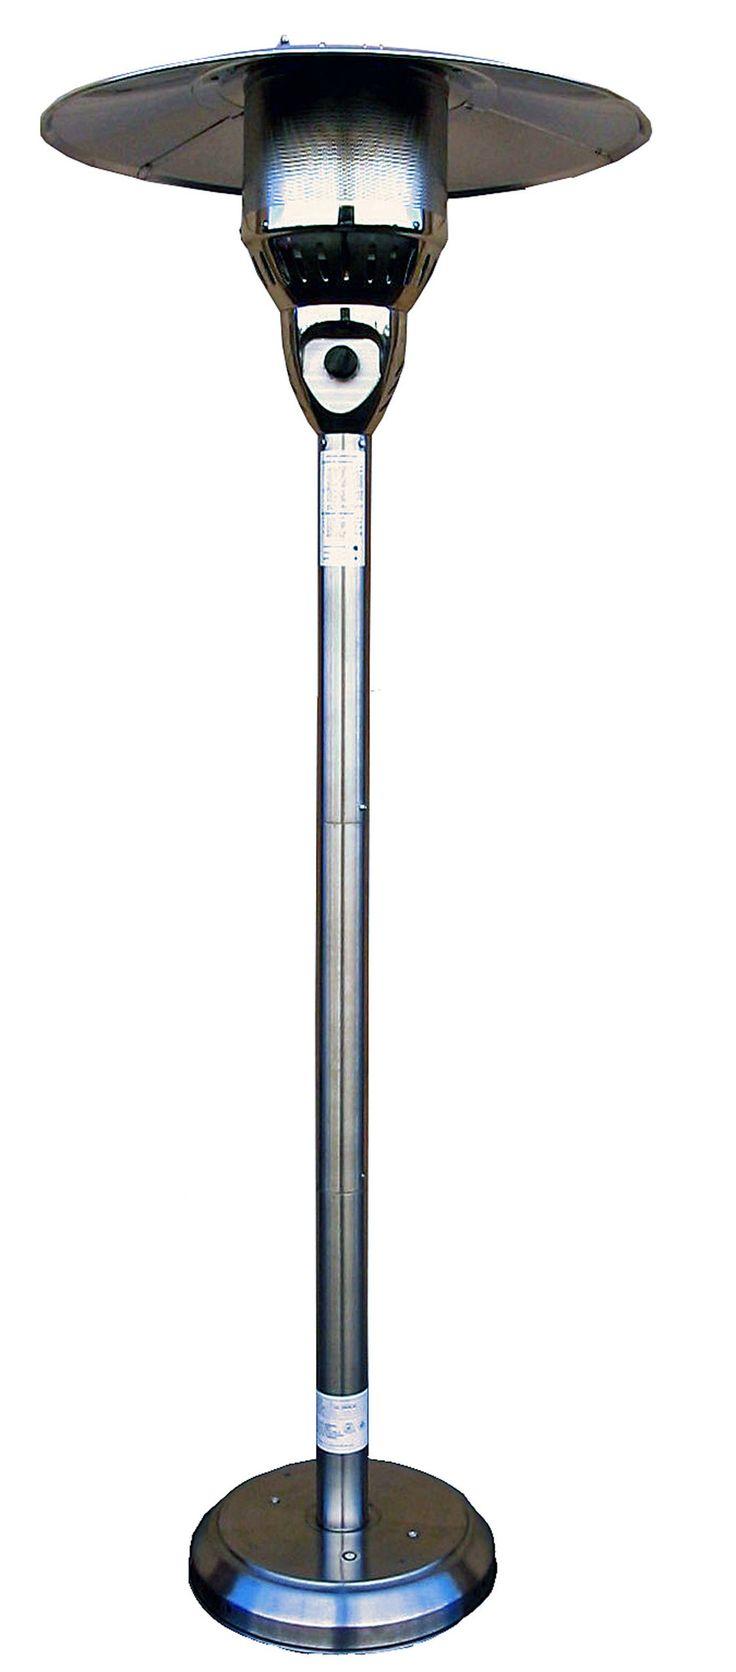 AZ Patio Heaters Natural Gas Patio Heater & Reviews | Wayfair